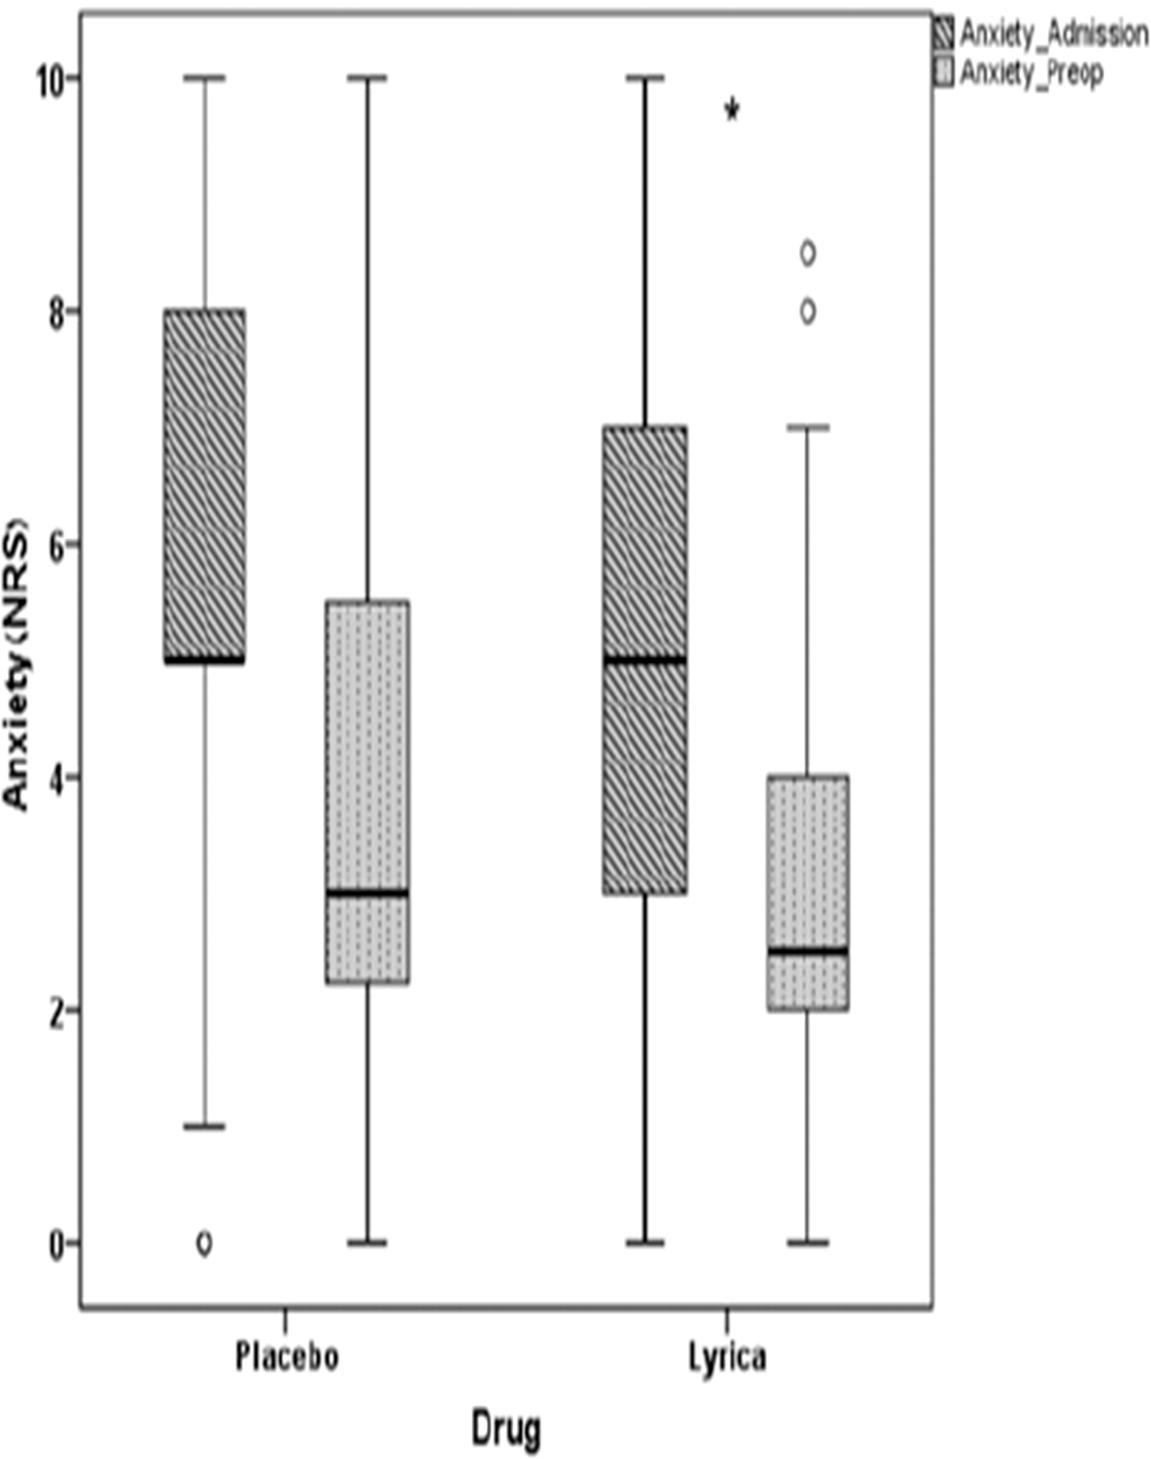 Perioperative pregabalin for reducing pain, analgesic